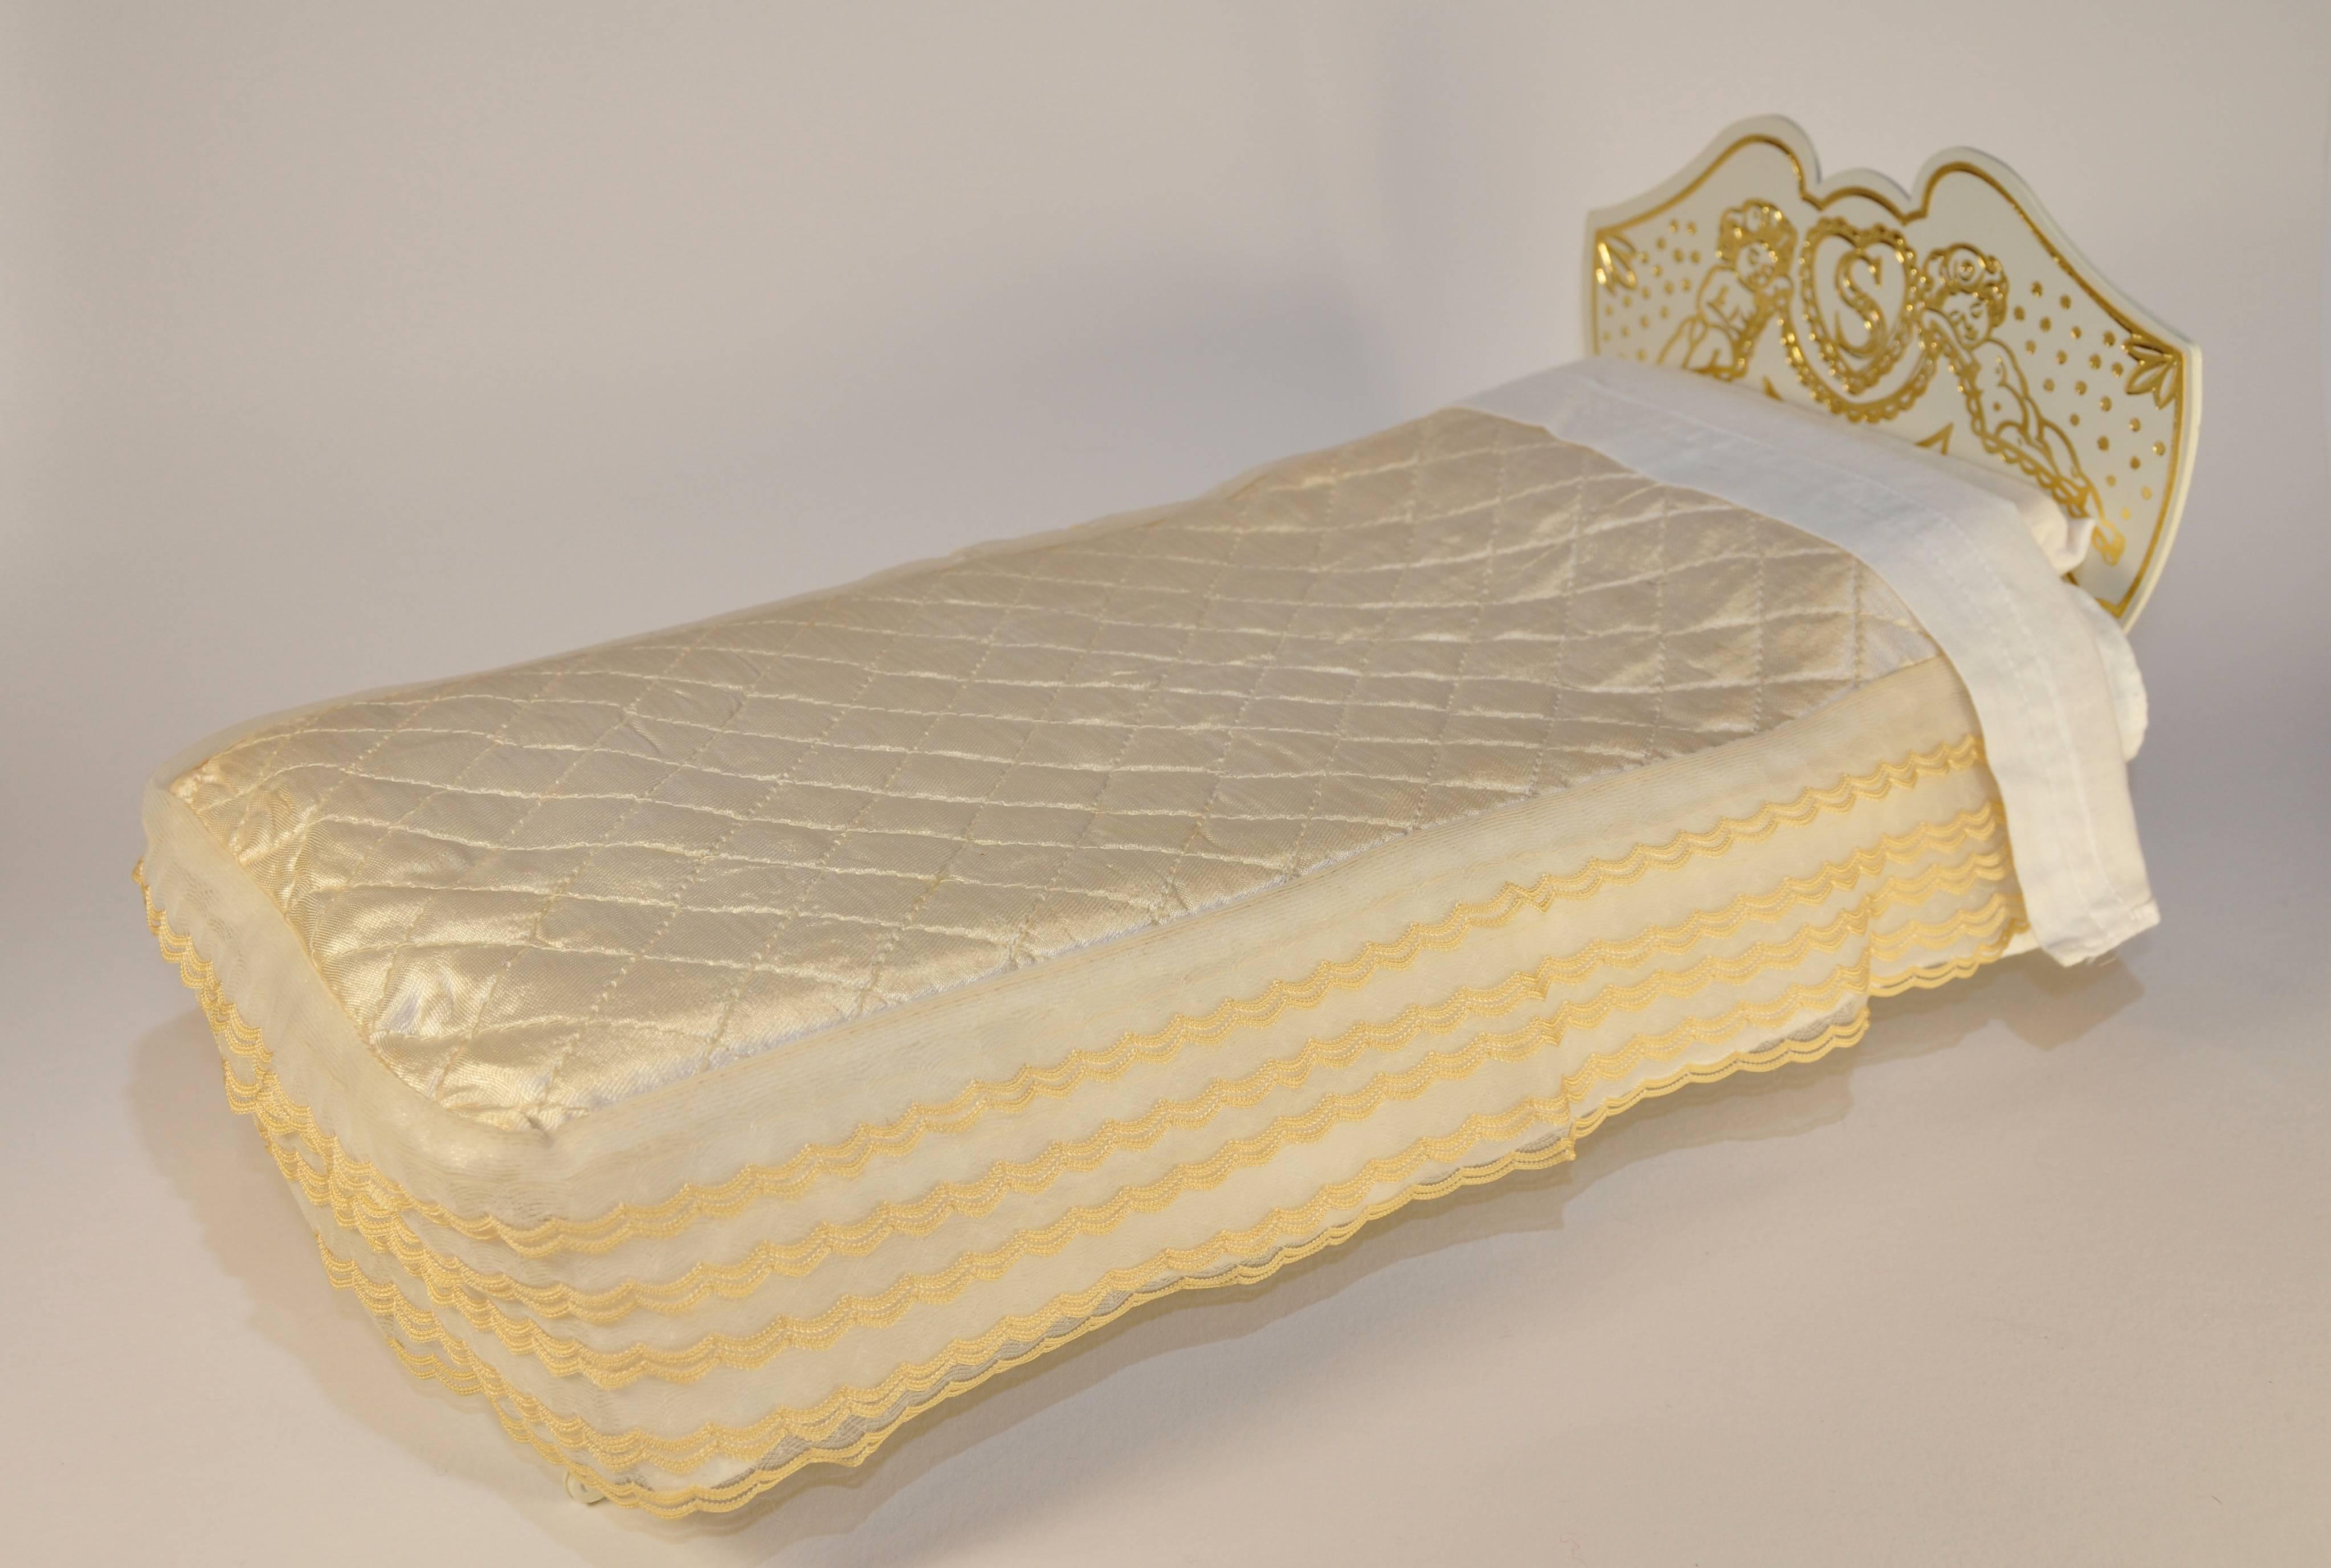 Bed - original version